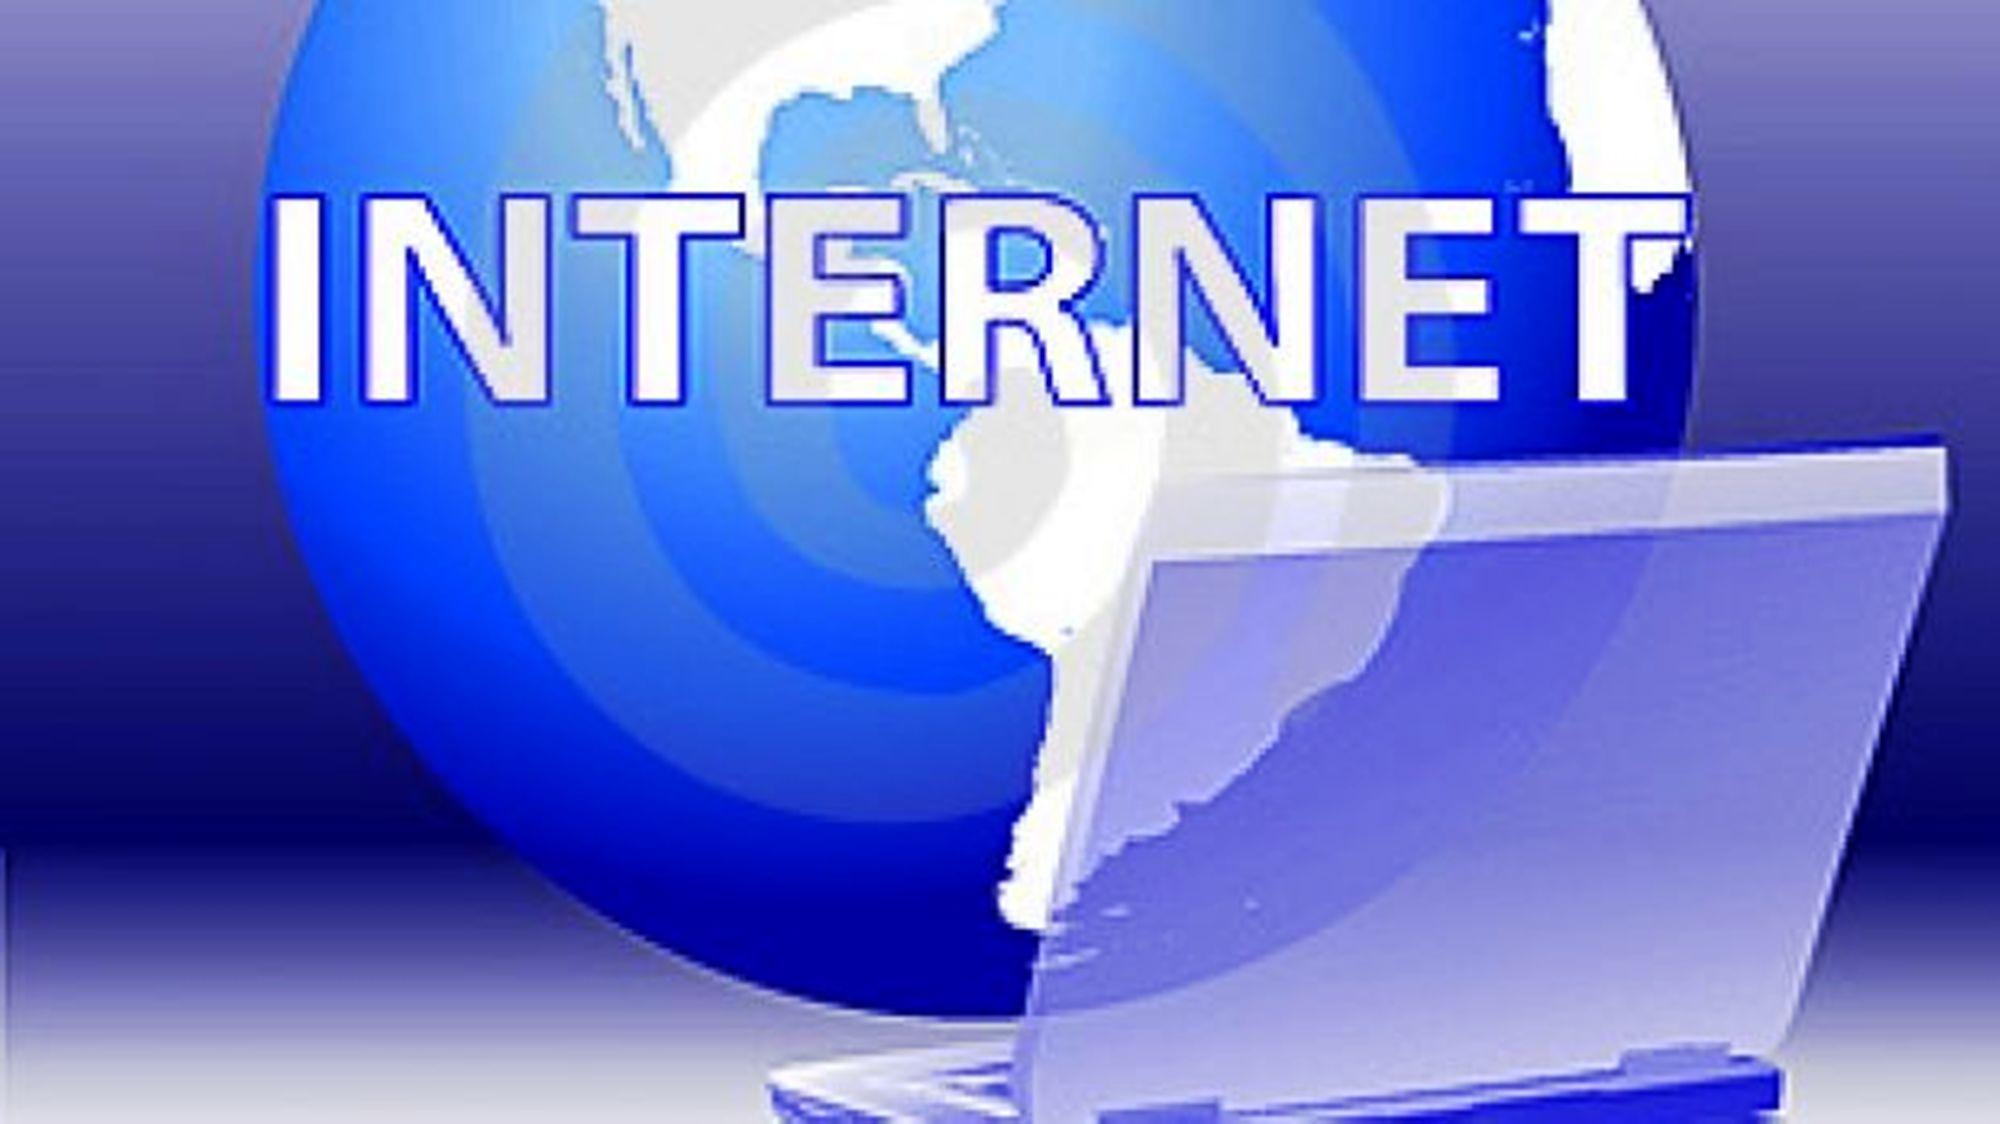 internet 20201028135111